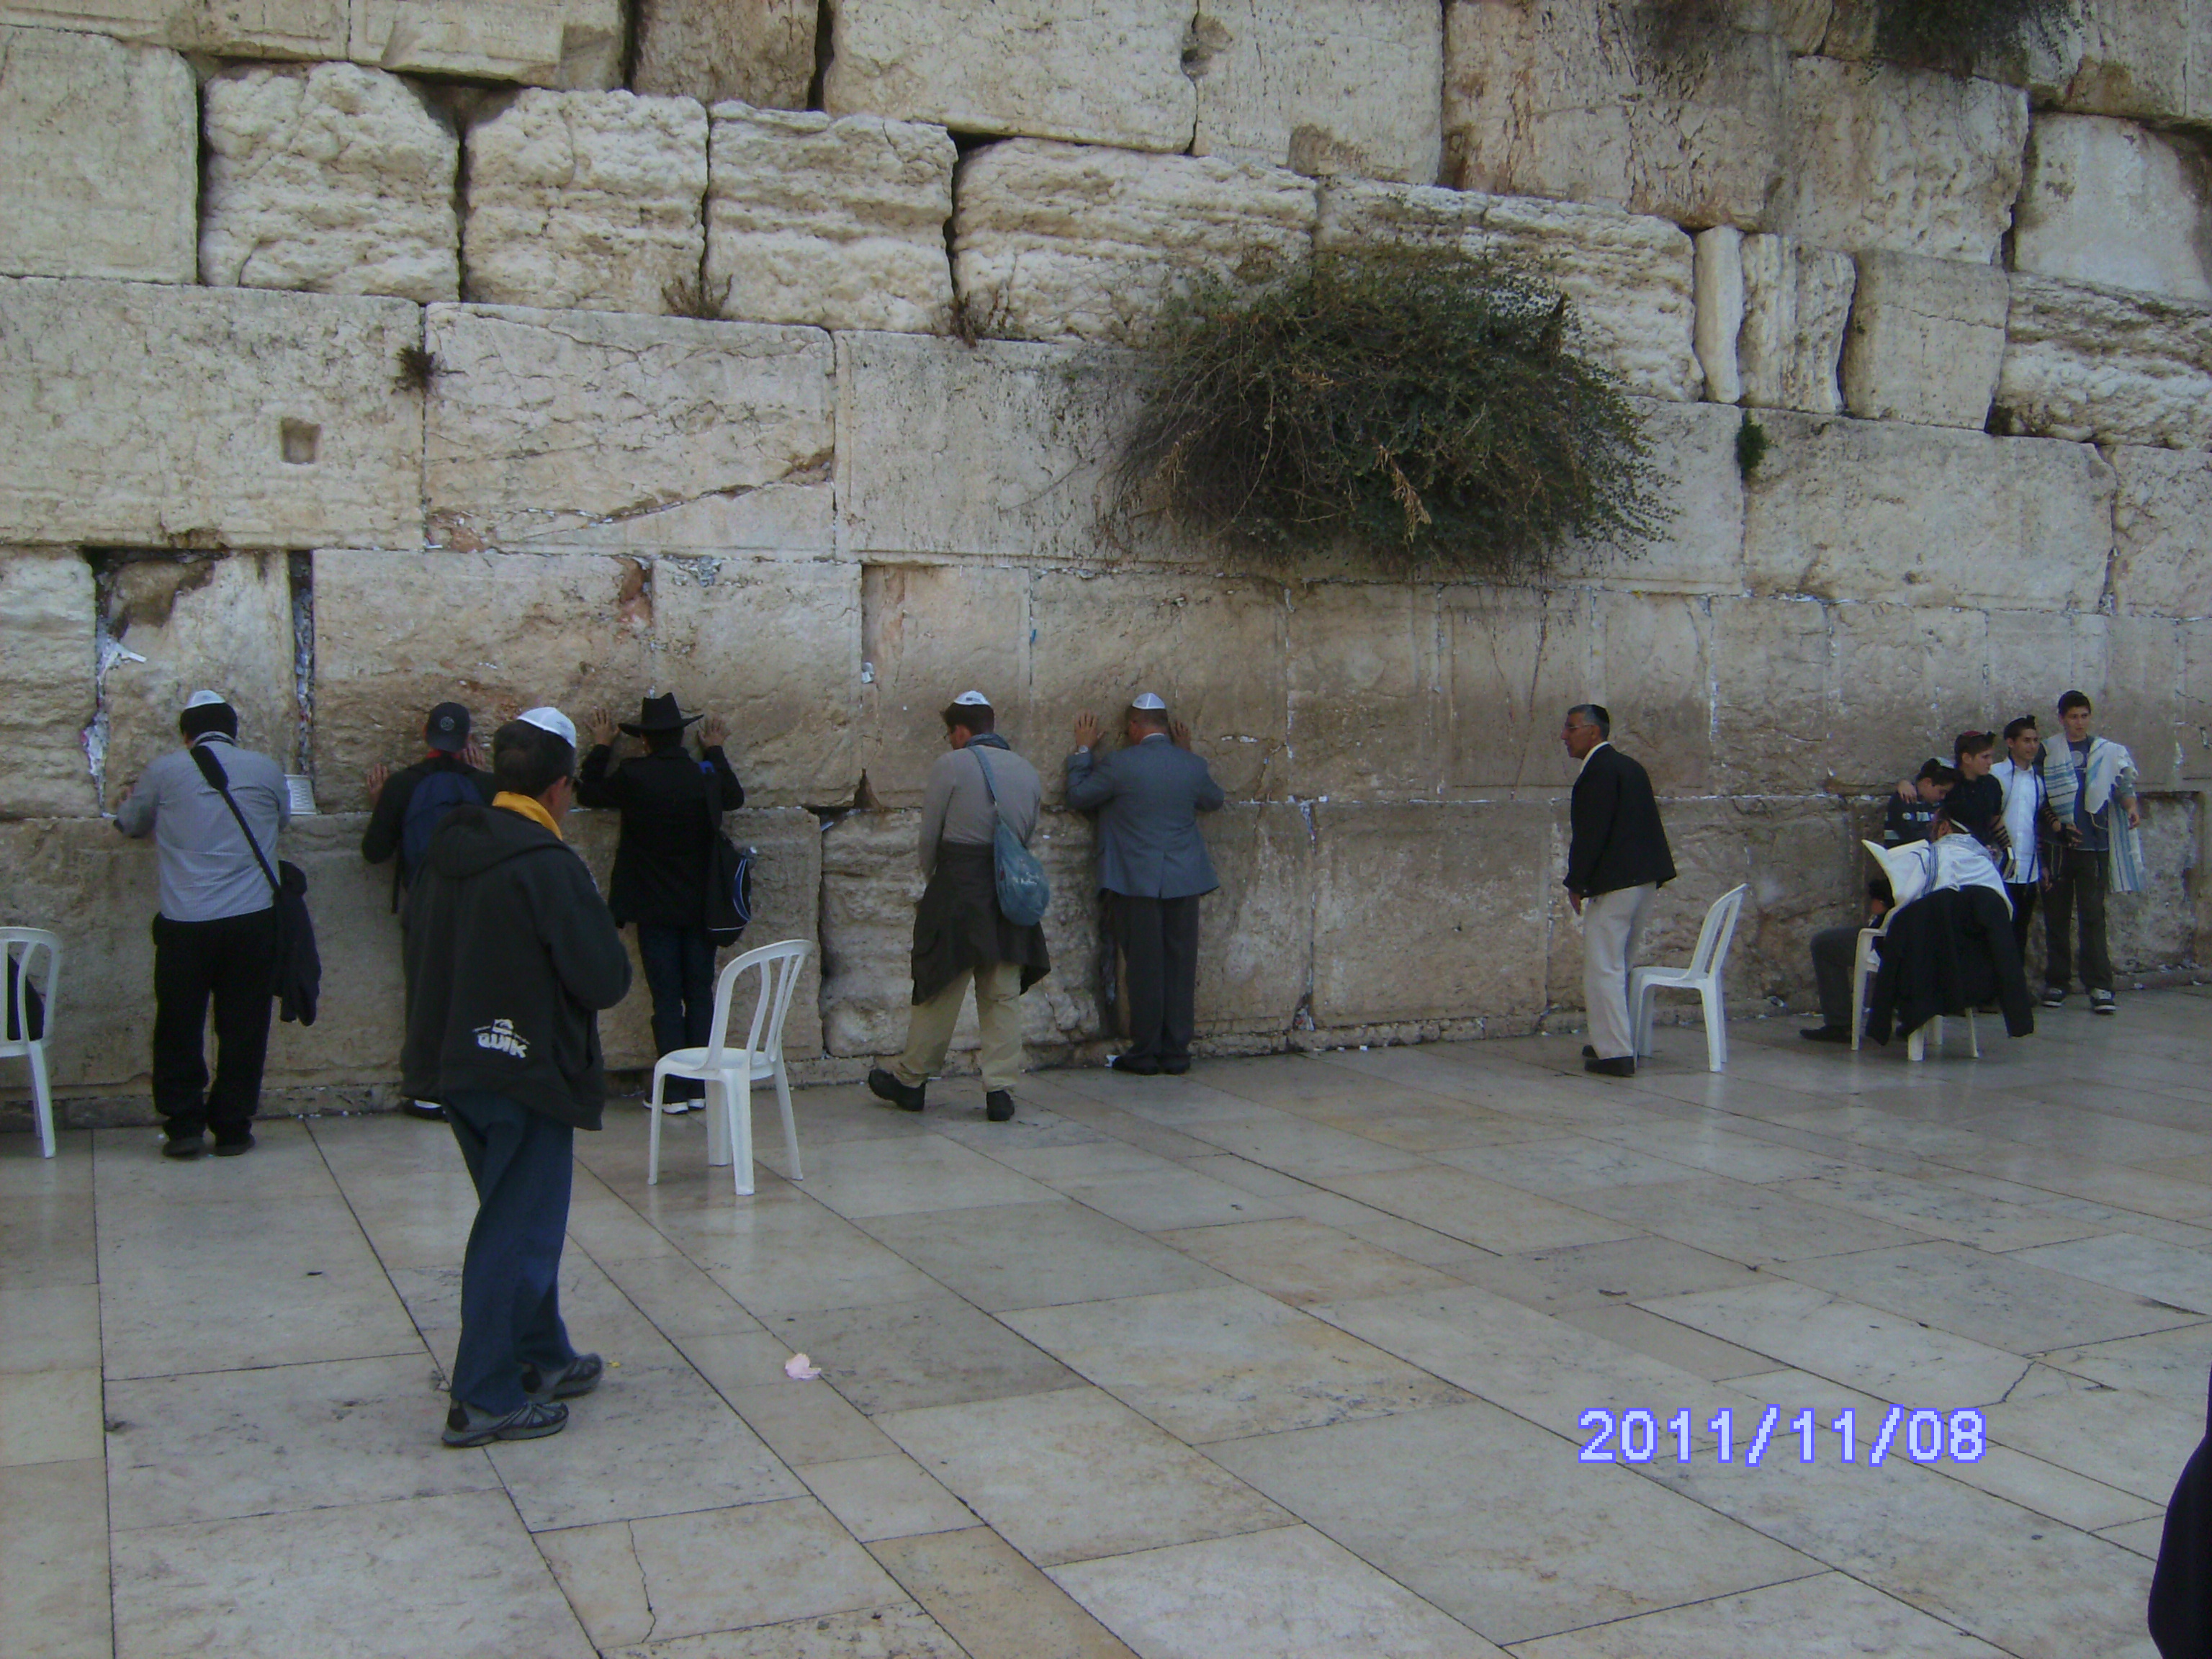 kotal_jerusalem.JPG - 2421685 Bytes